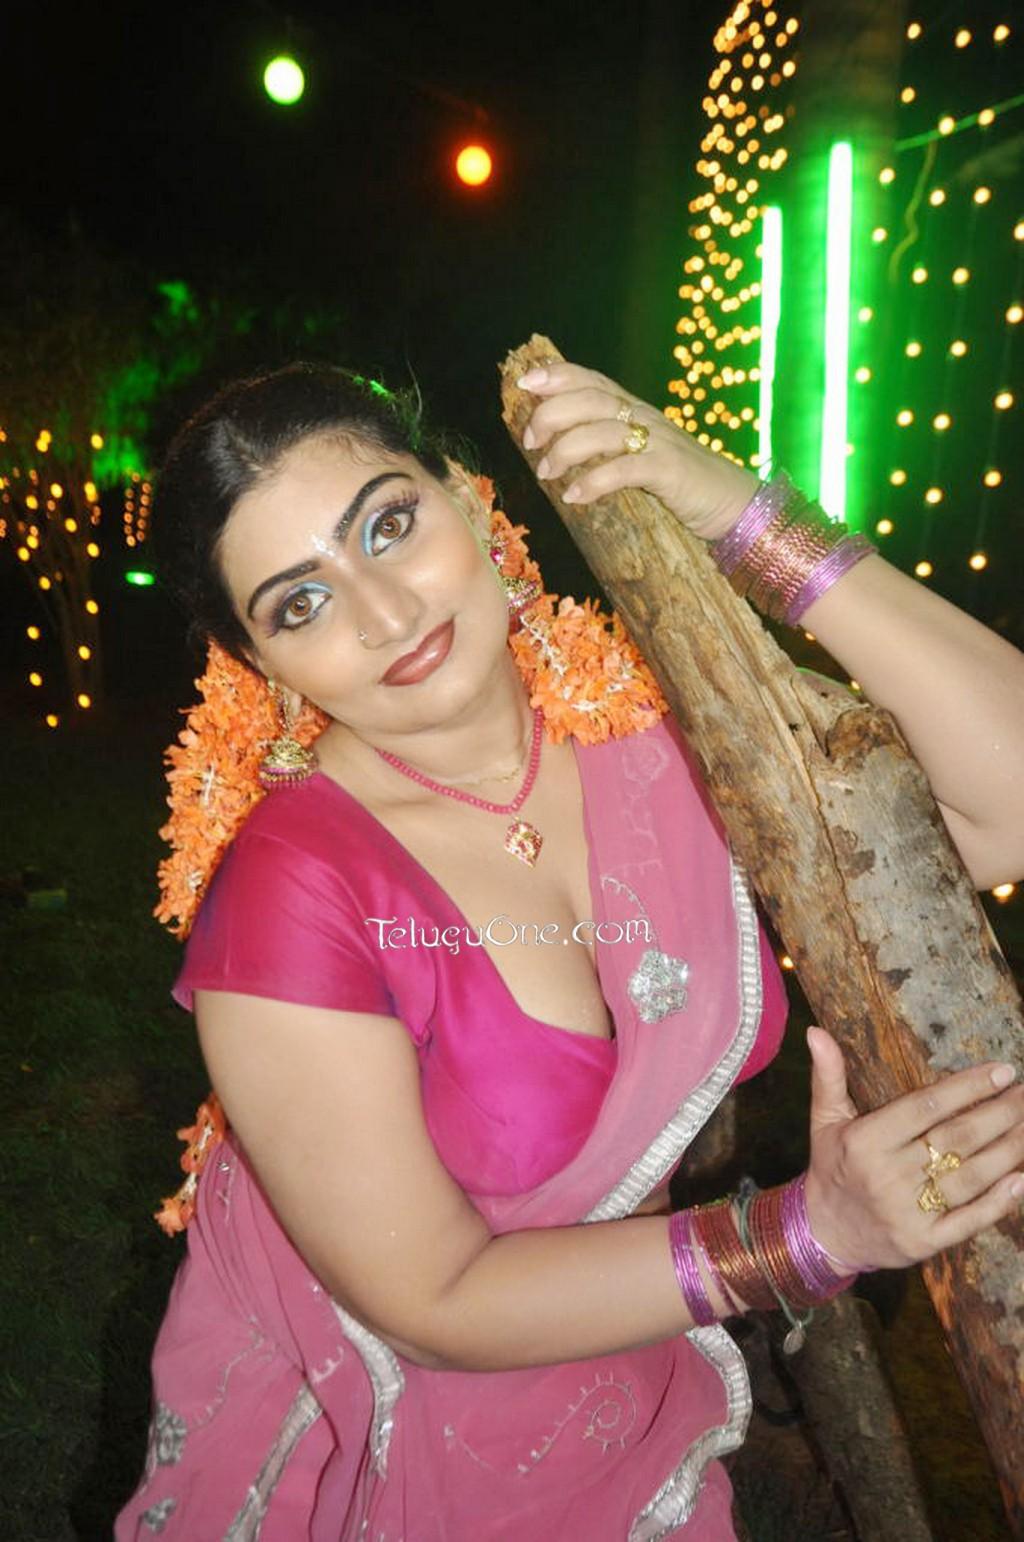 desi mallu aunty shilpa exposing photo search results calendar